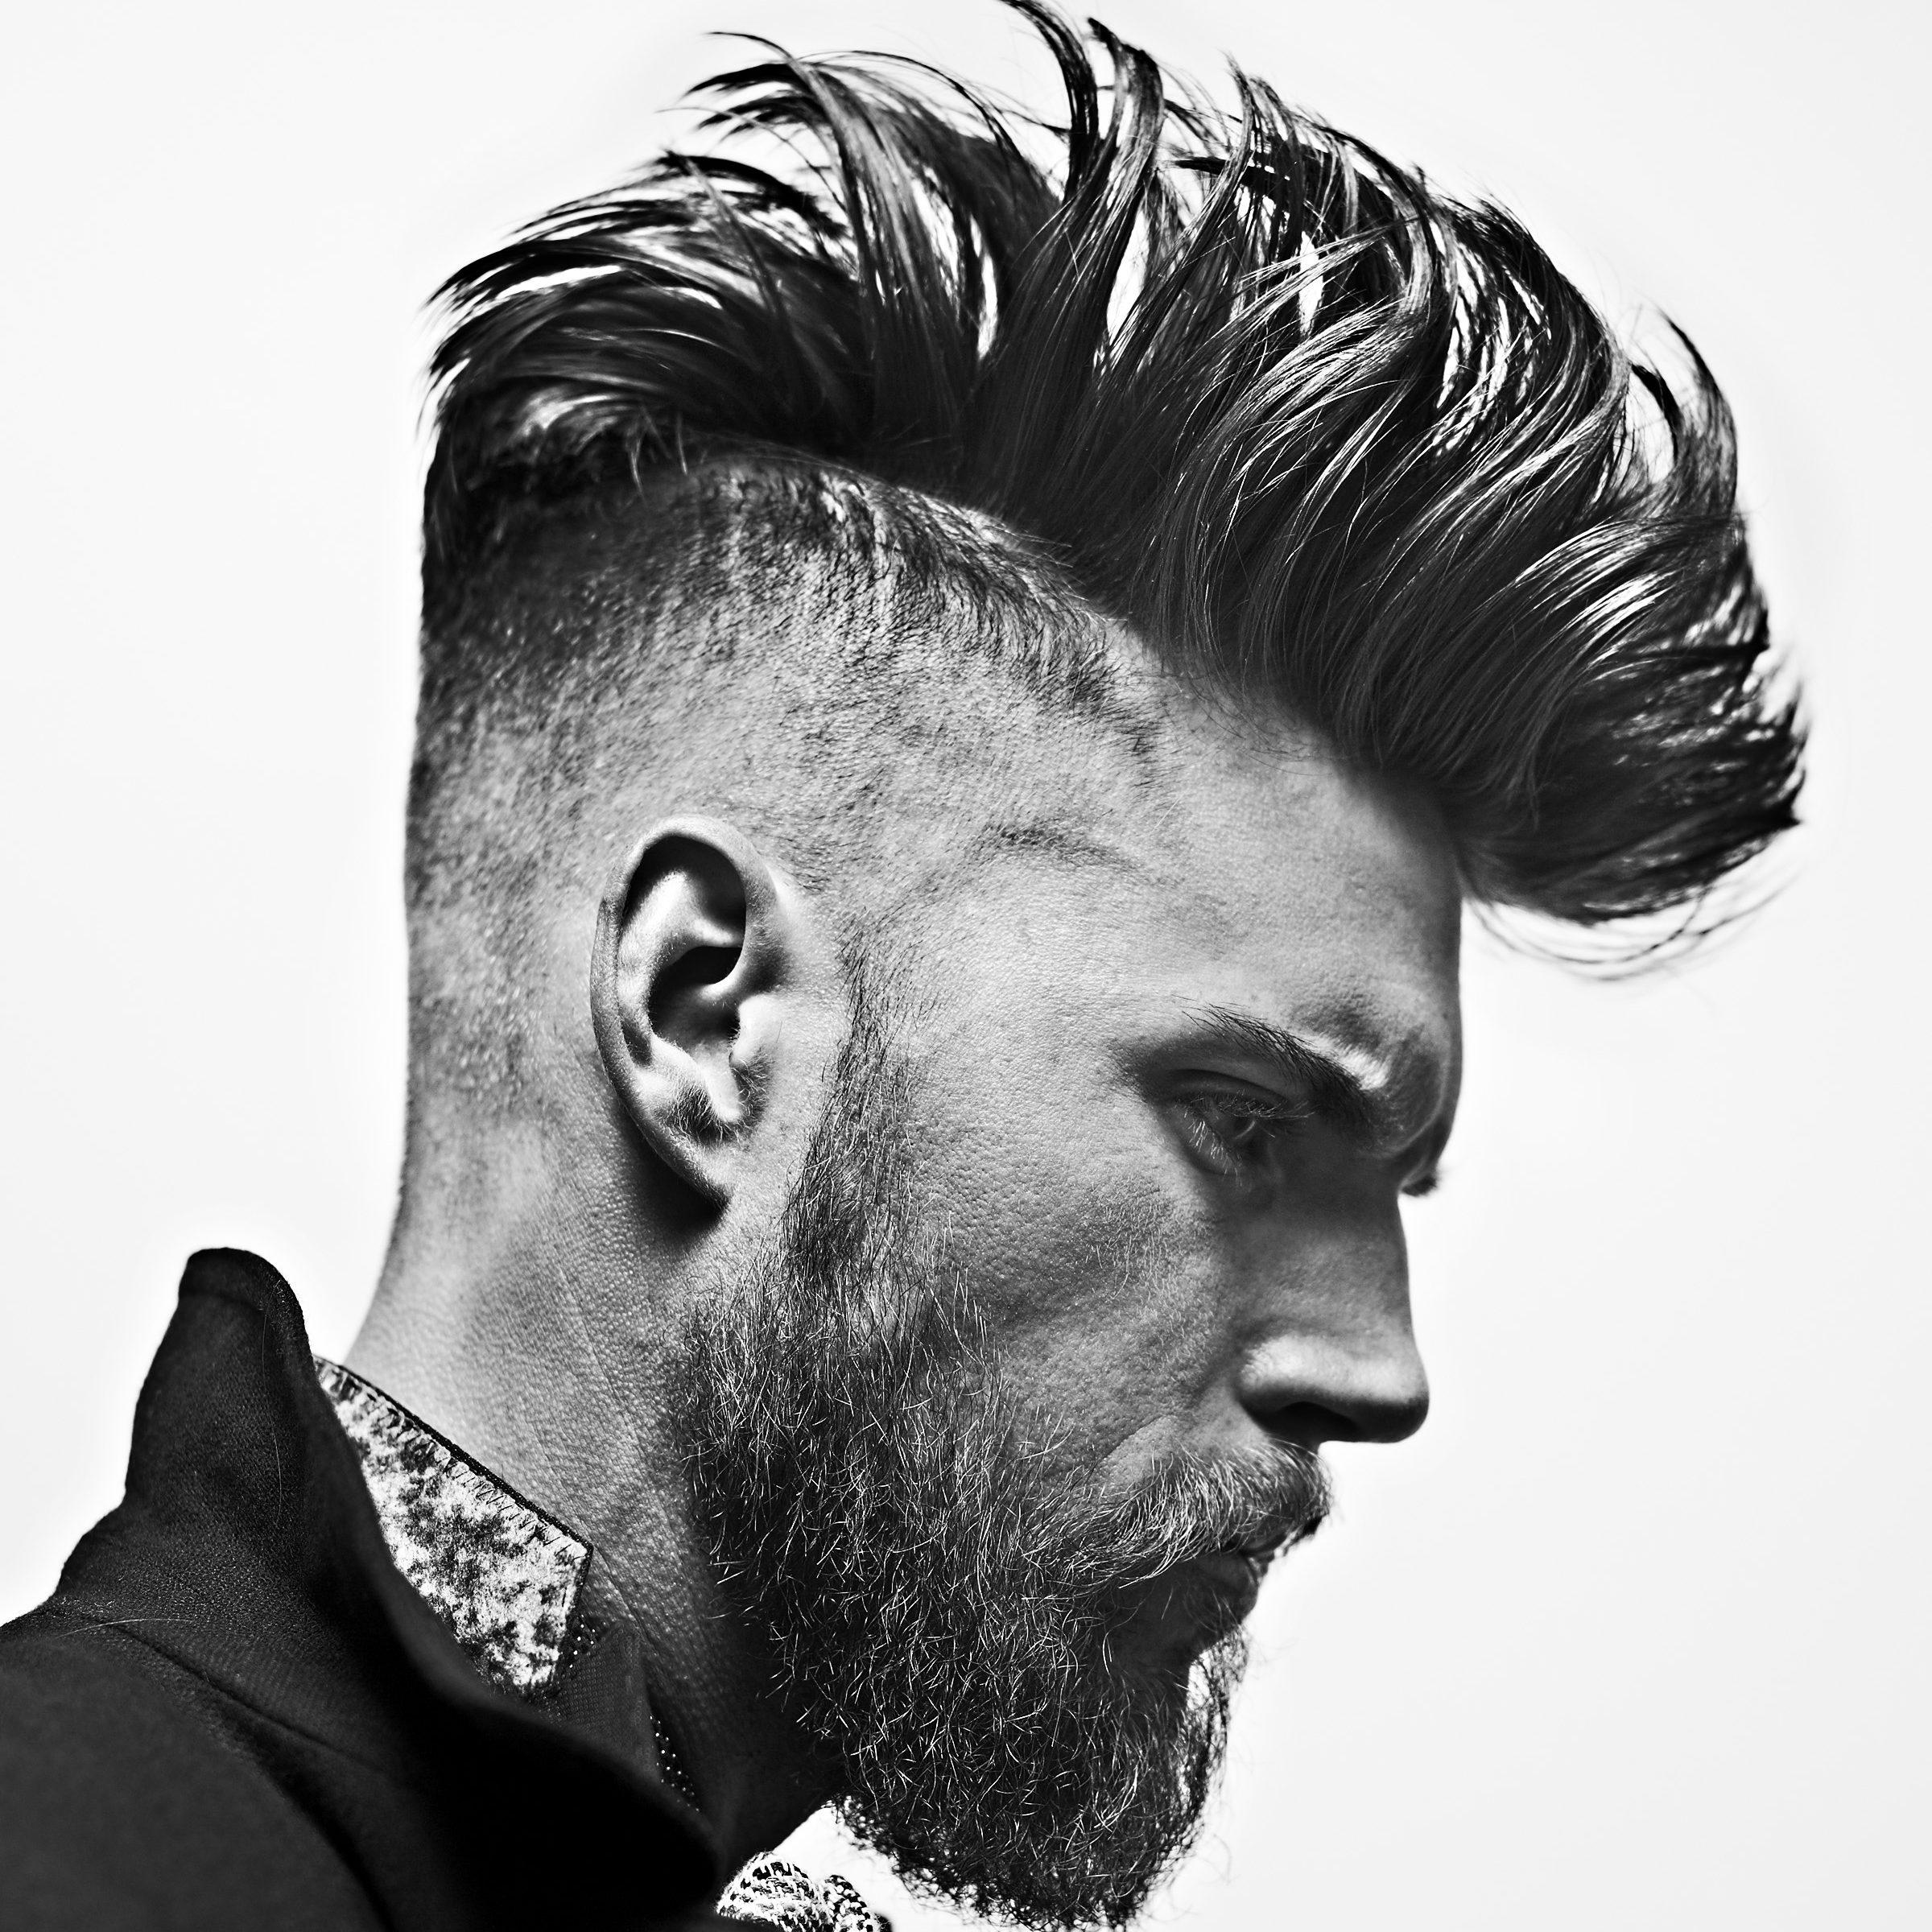 50 Modern Mohawk Haircut Styles – Make Your Daring Elegant Inside Famous Fancy Mohawk Haircuts (View 2 of 20)